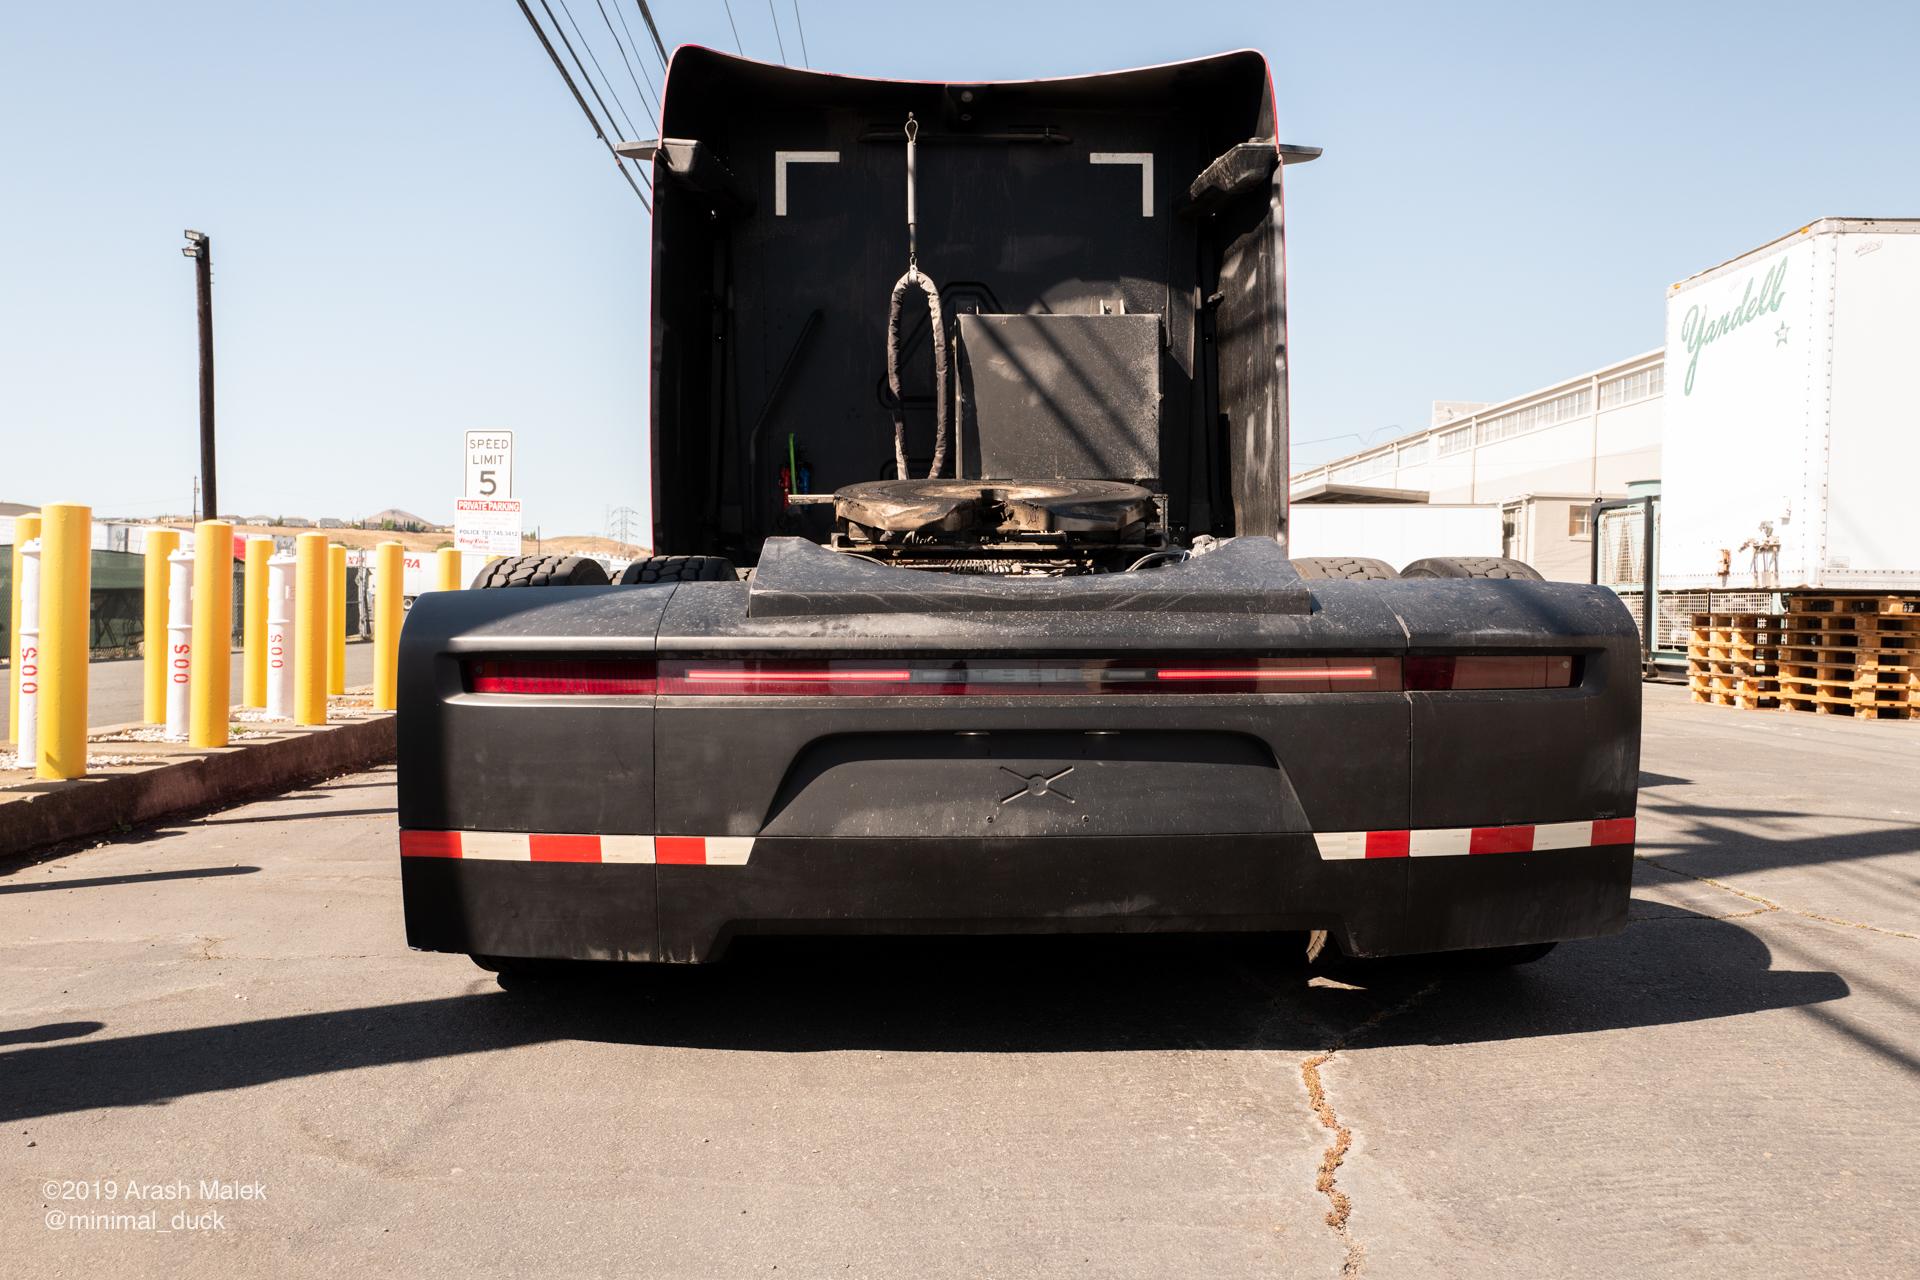 tesla-semi-yandell-truckaway-15